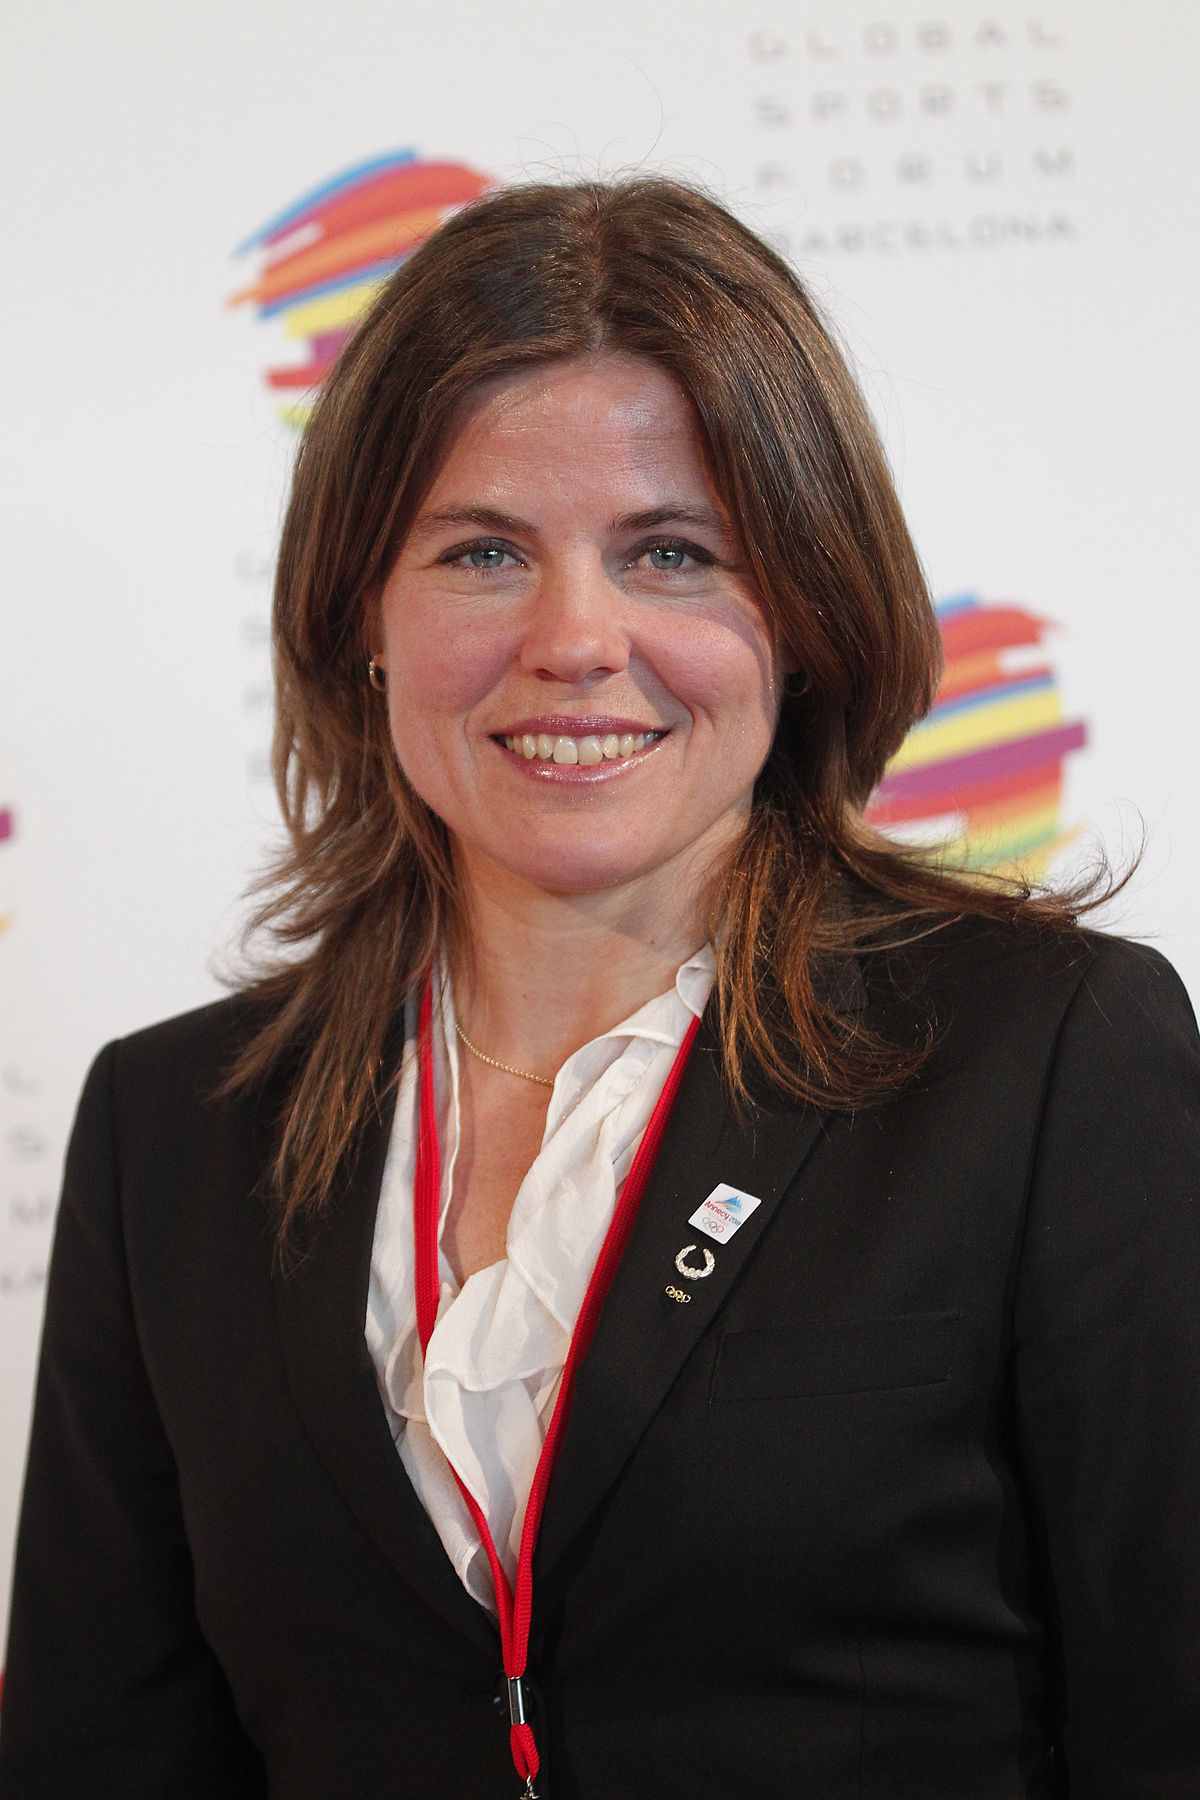 Pernilla wiberg wikipedia for Olimpici scandinavi